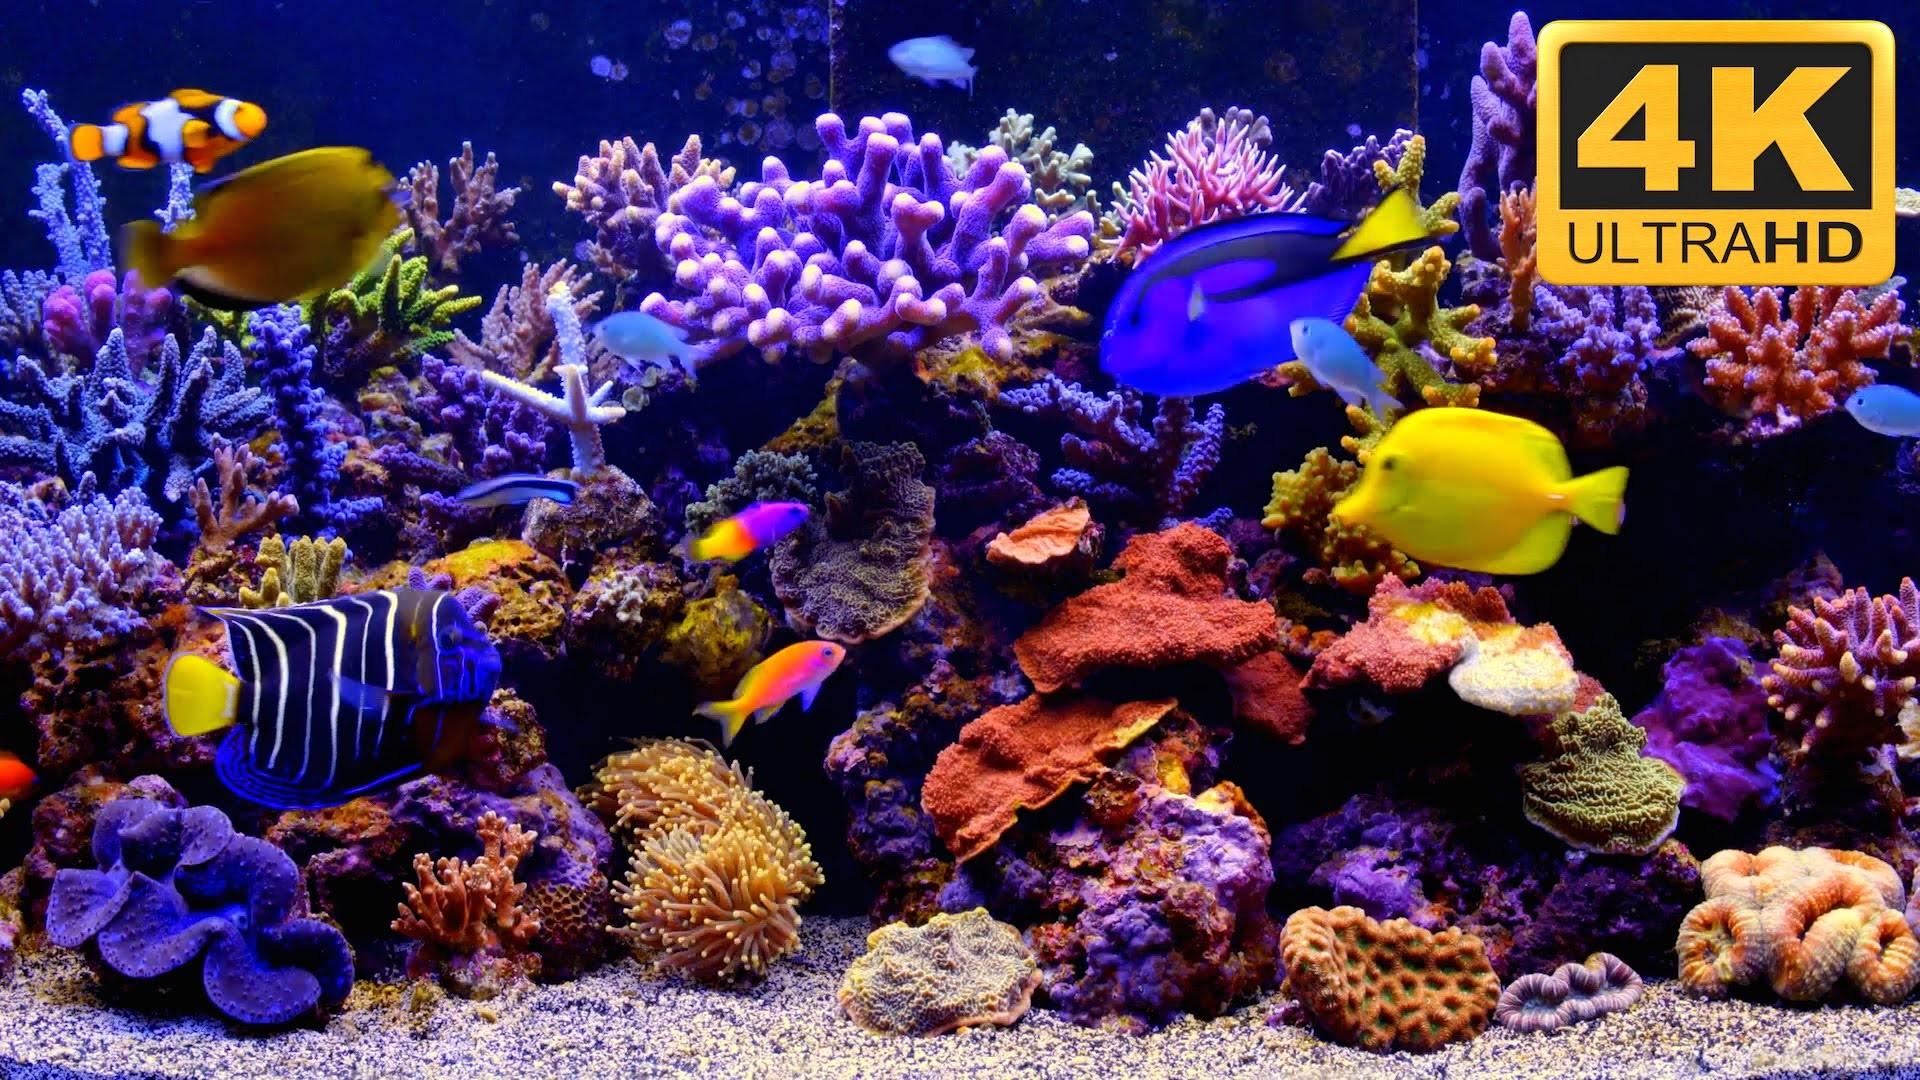 Full Size of Fish Tank Free Fish Tank Tv Screensaver Download Best With  Soundfish Windows Fish …